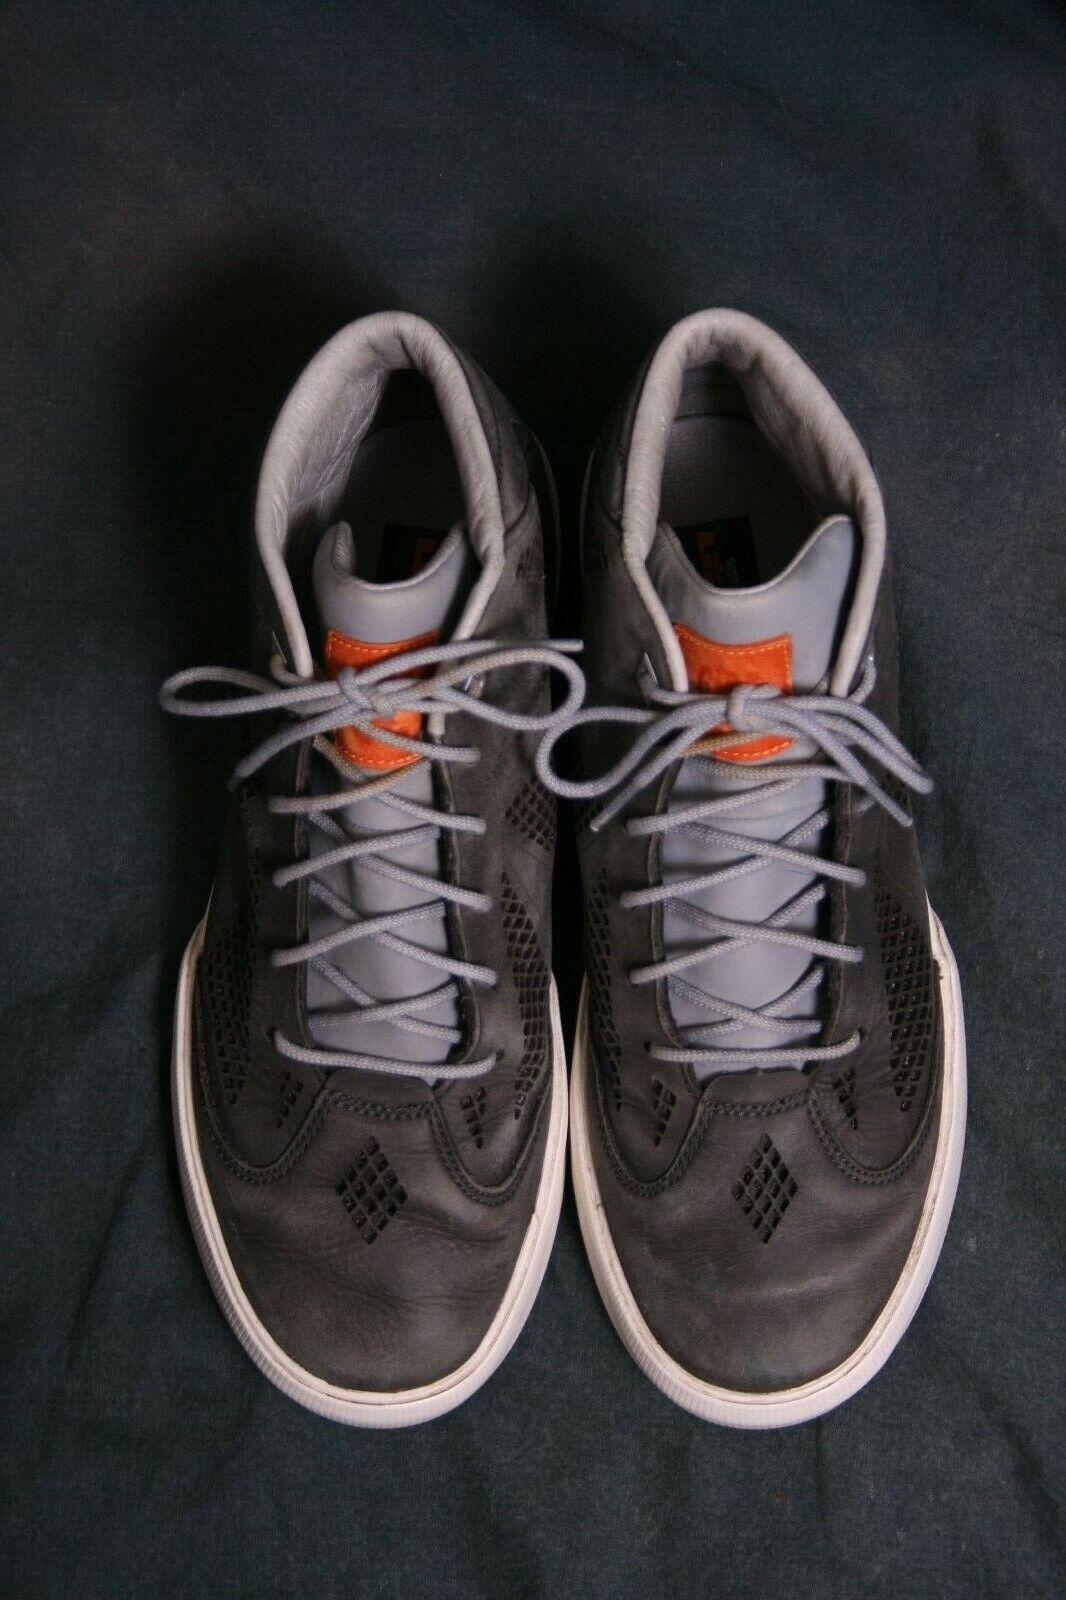 Nike Virescit Vulnere Virtus size 7 trainers